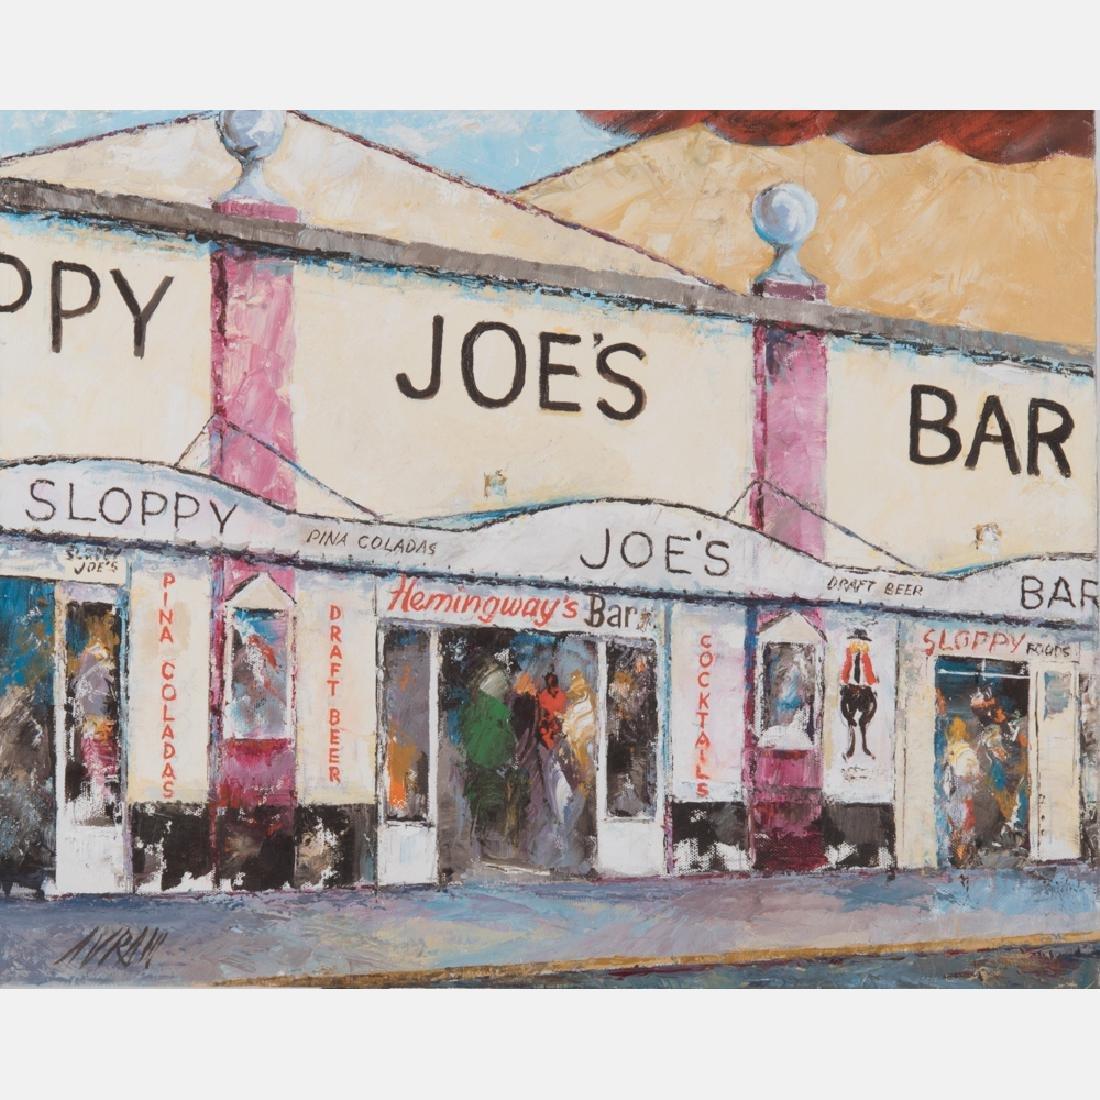 Avram (20th Century) Sloppy Joe's Bar, Oil on canvas,